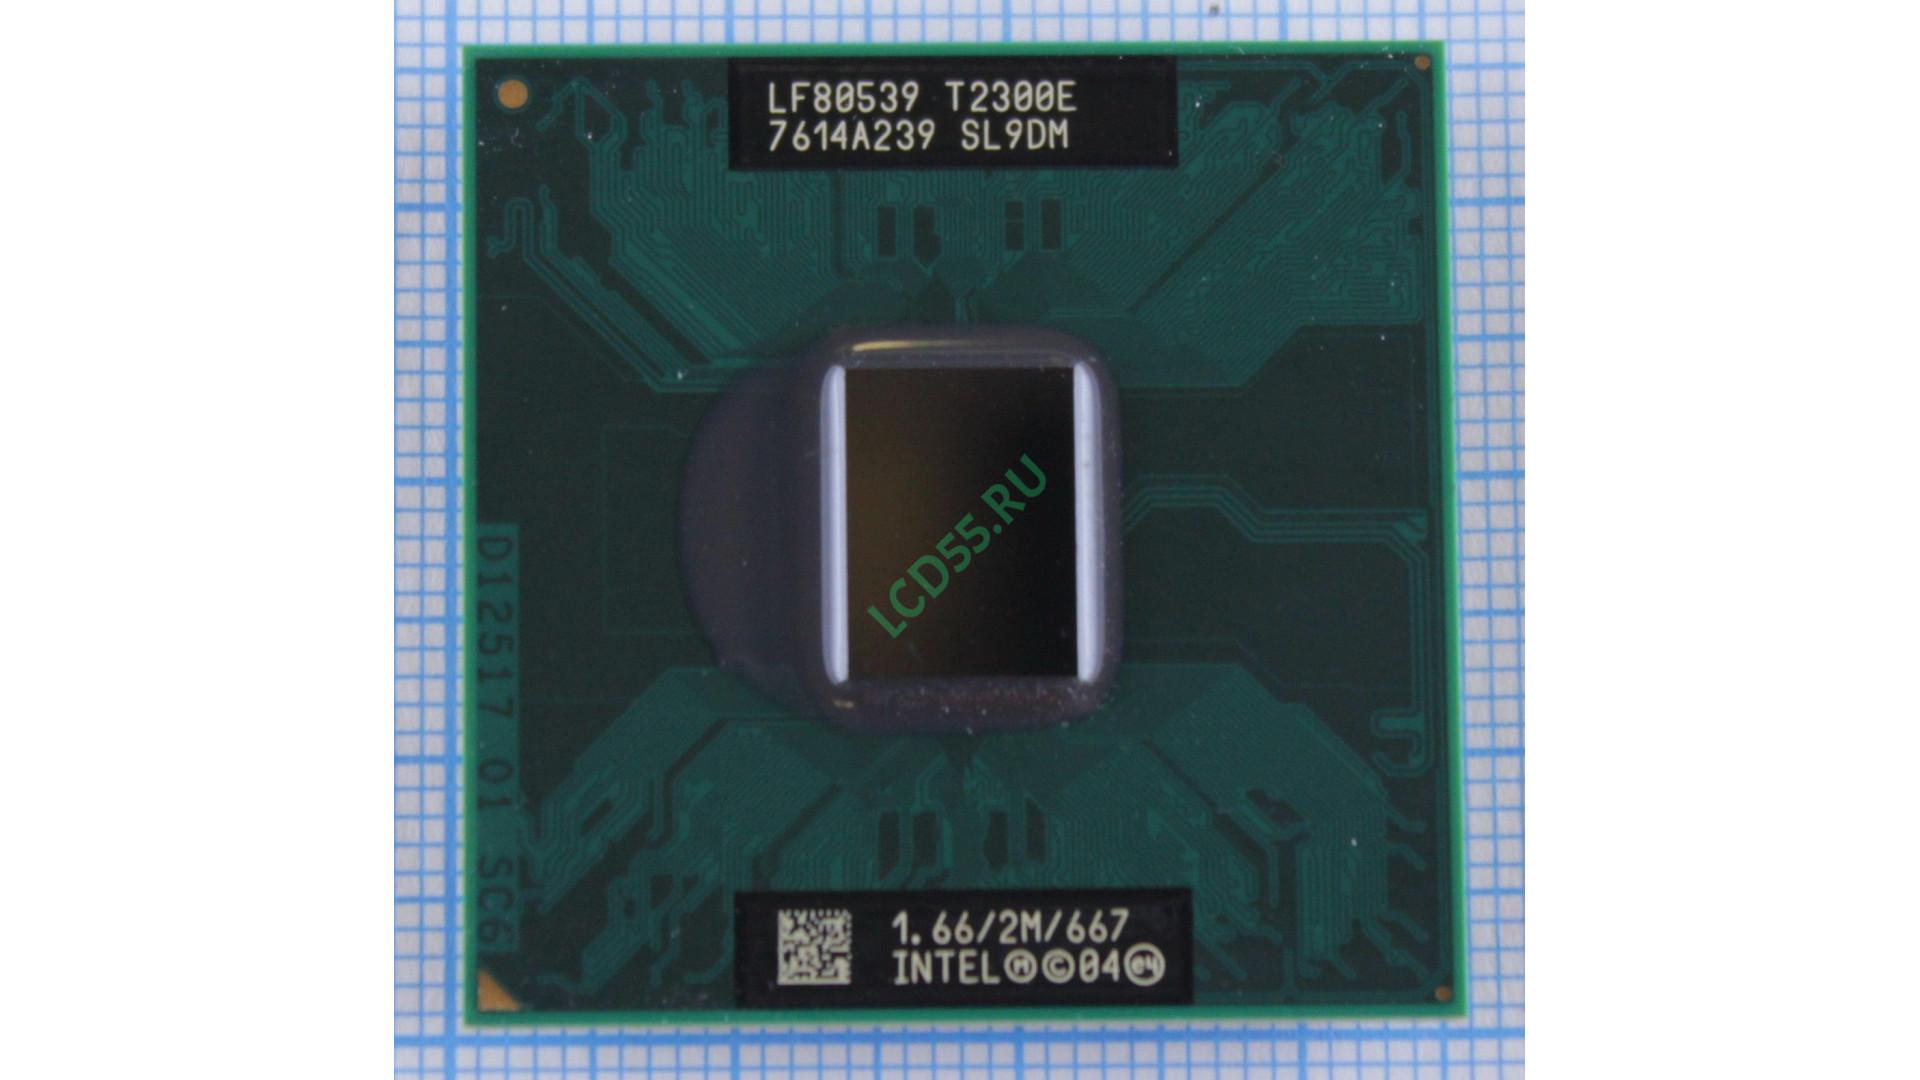 Intel T2300E SL9DM